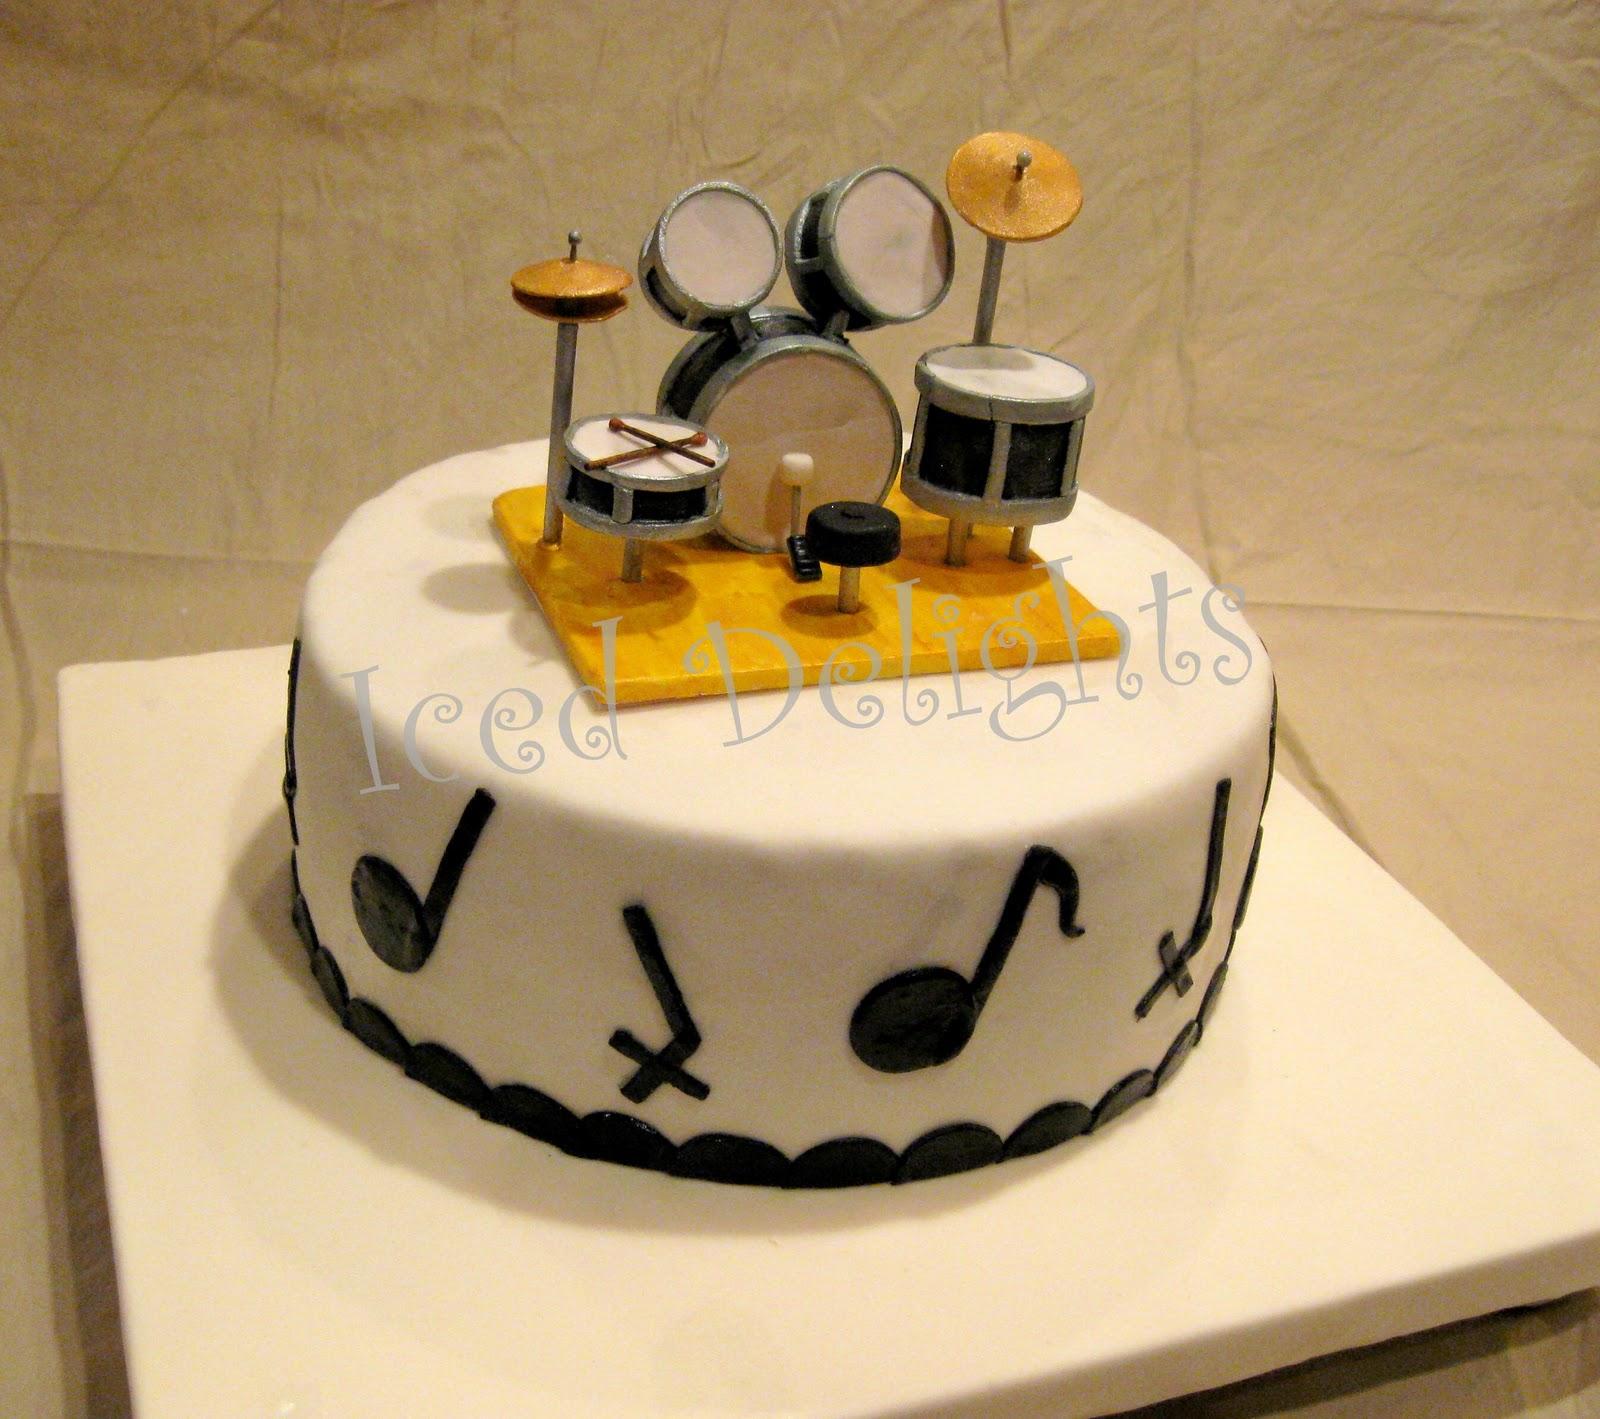 Awe Inspiring 10 Birthday Cakes Like A Drum Photo Drum Set Birthday Cake Drum Funny Birthday Cards Online Bapapcheapnameinfo